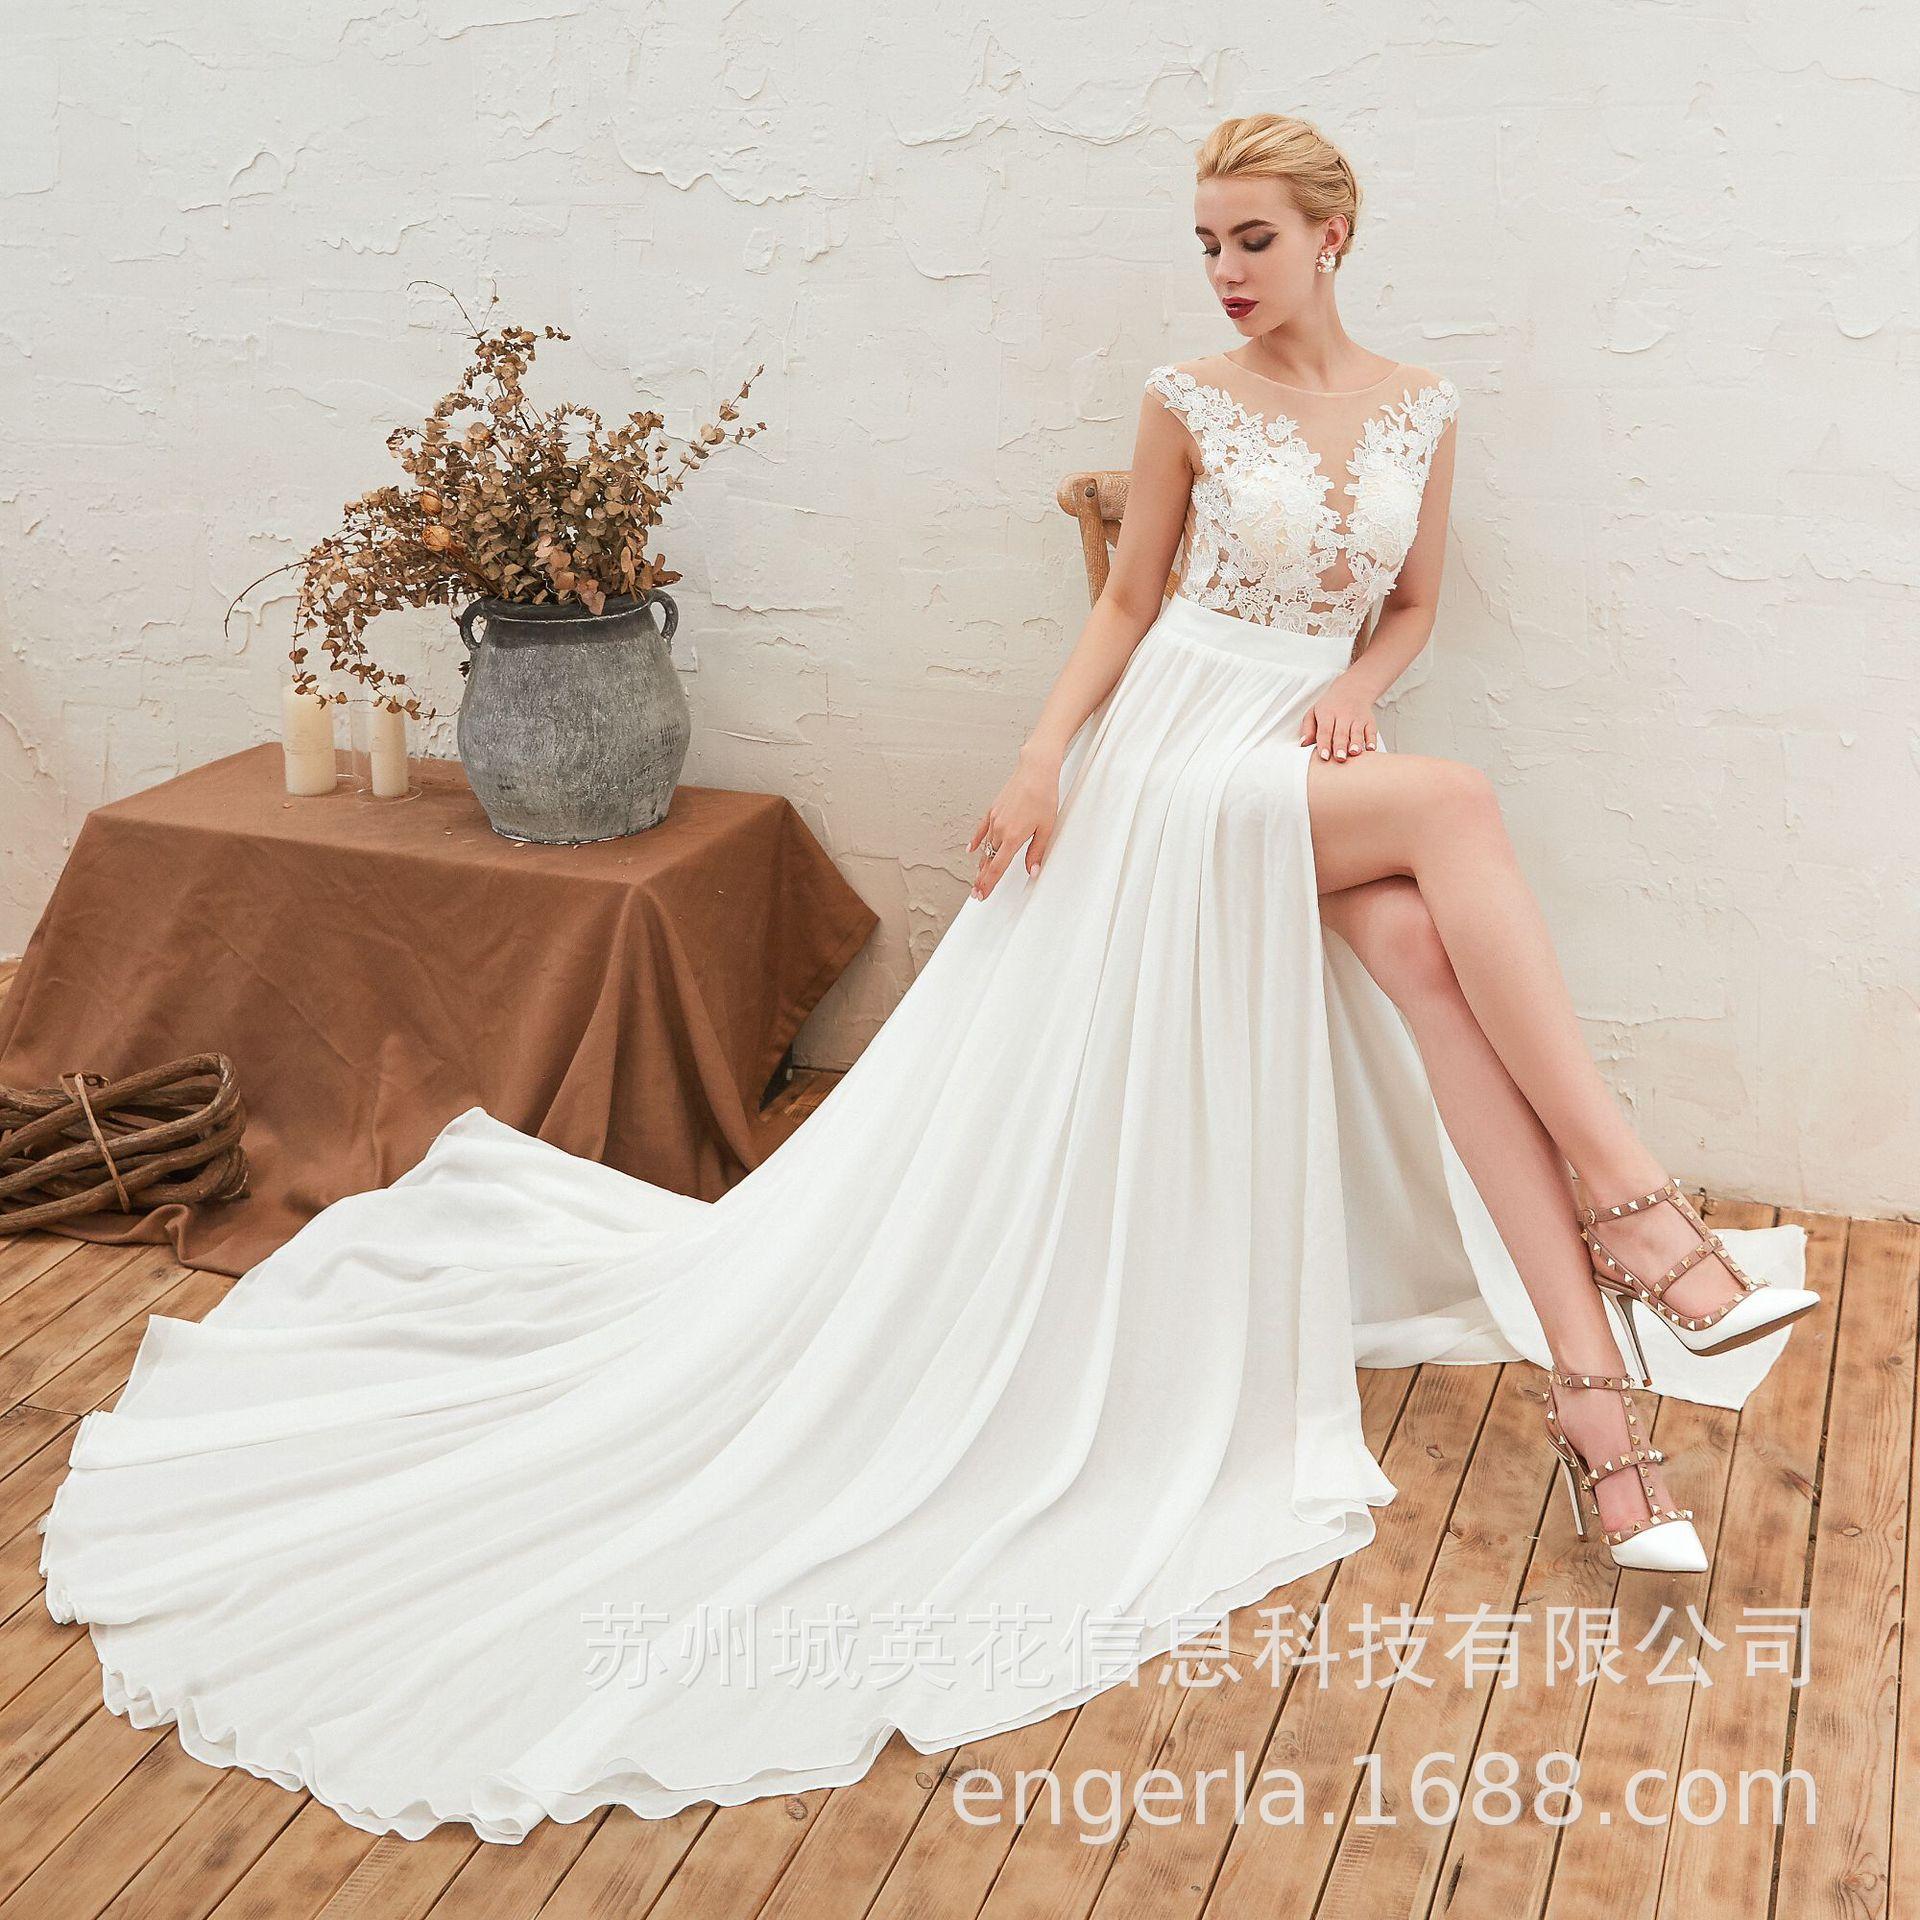 Beach Wedding Dresses 2019 Split White Chiffon Cap Sleeve See Through Lace Sexy Bridal Mariage De Novia Bride Robe Mariee Modest